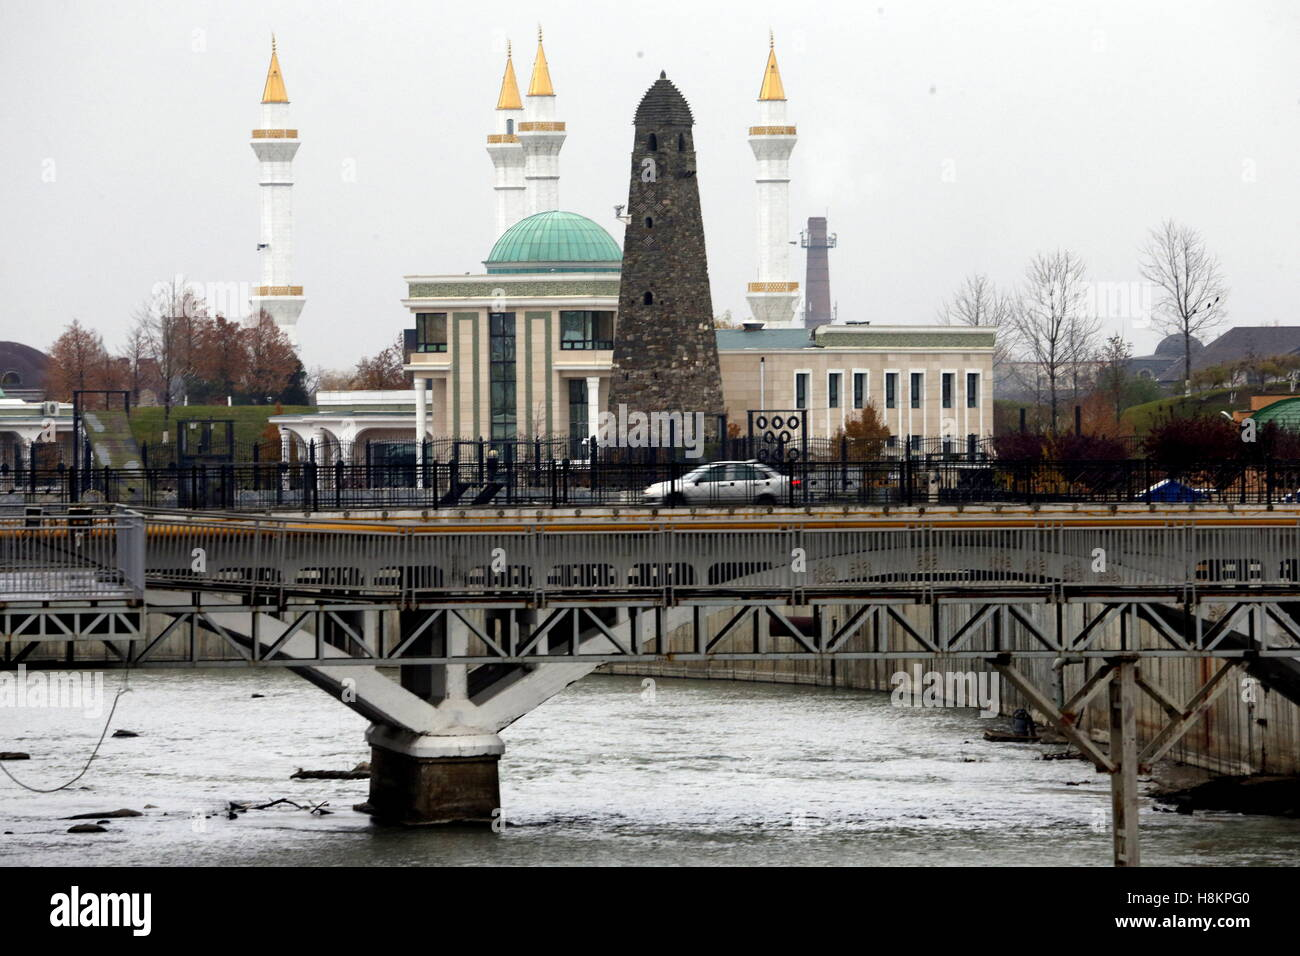 Grozny, Russia. 13th Nov, 2016. A bridge over the Sunzha River. © Valery Matytsin/TASS/Alamy Live News - Stock Image